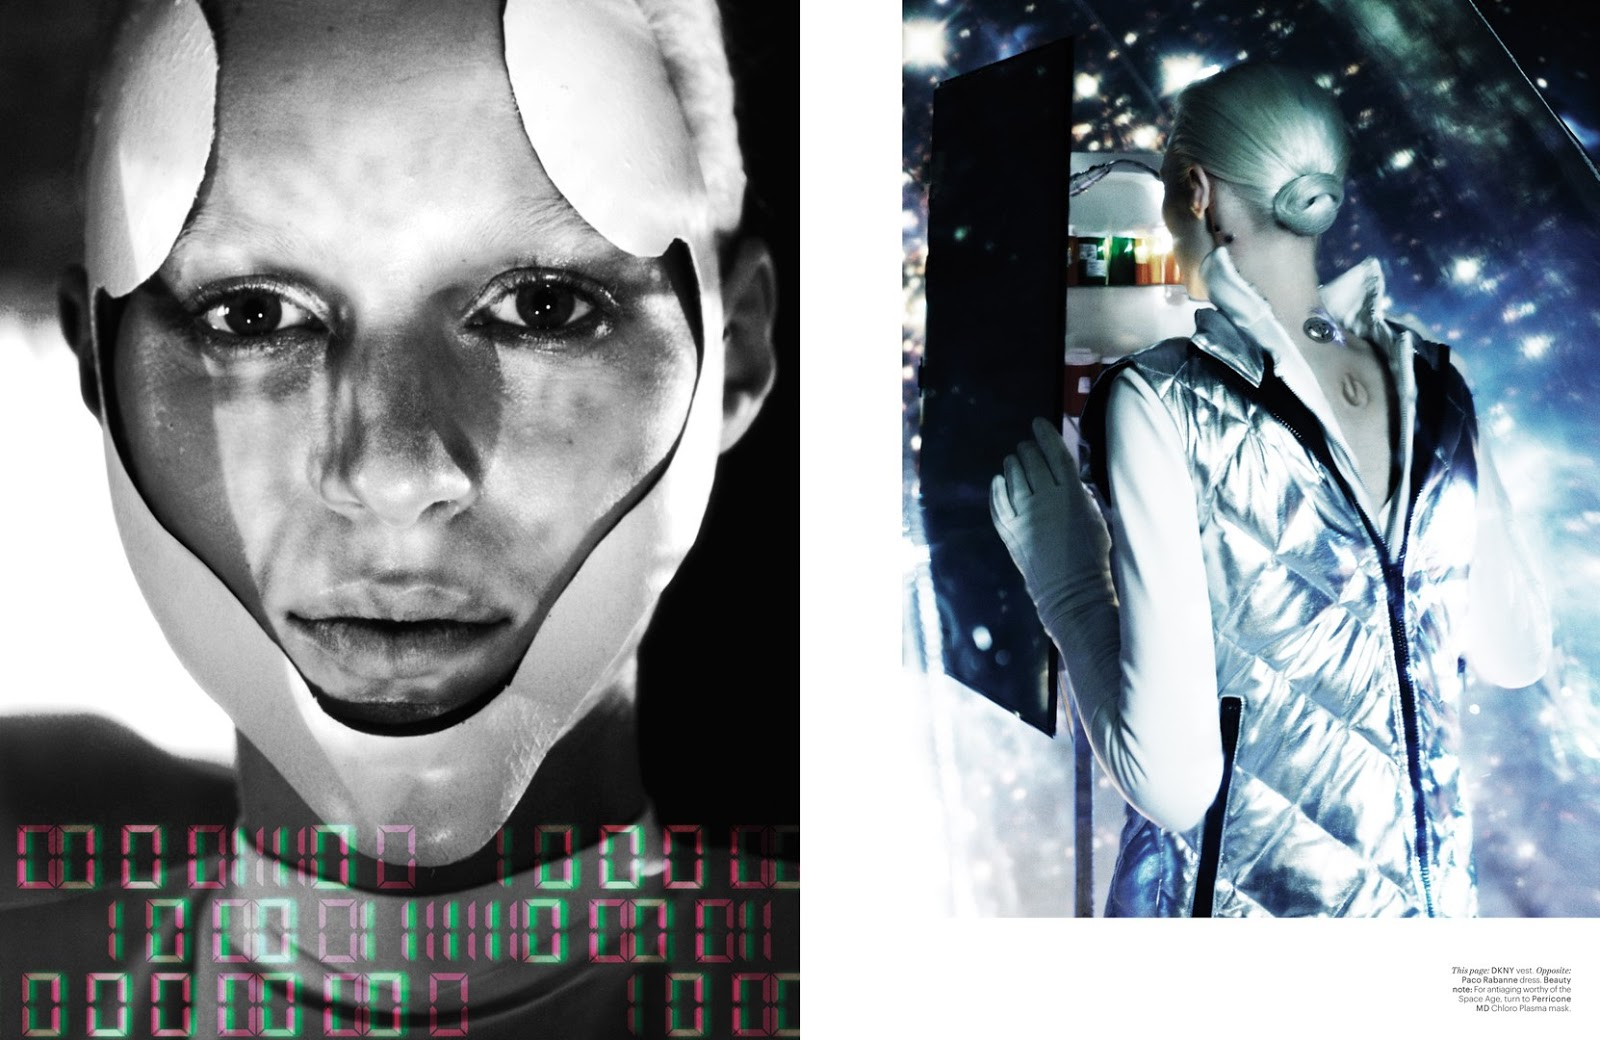 lost-in-cyber-space-2.jpg